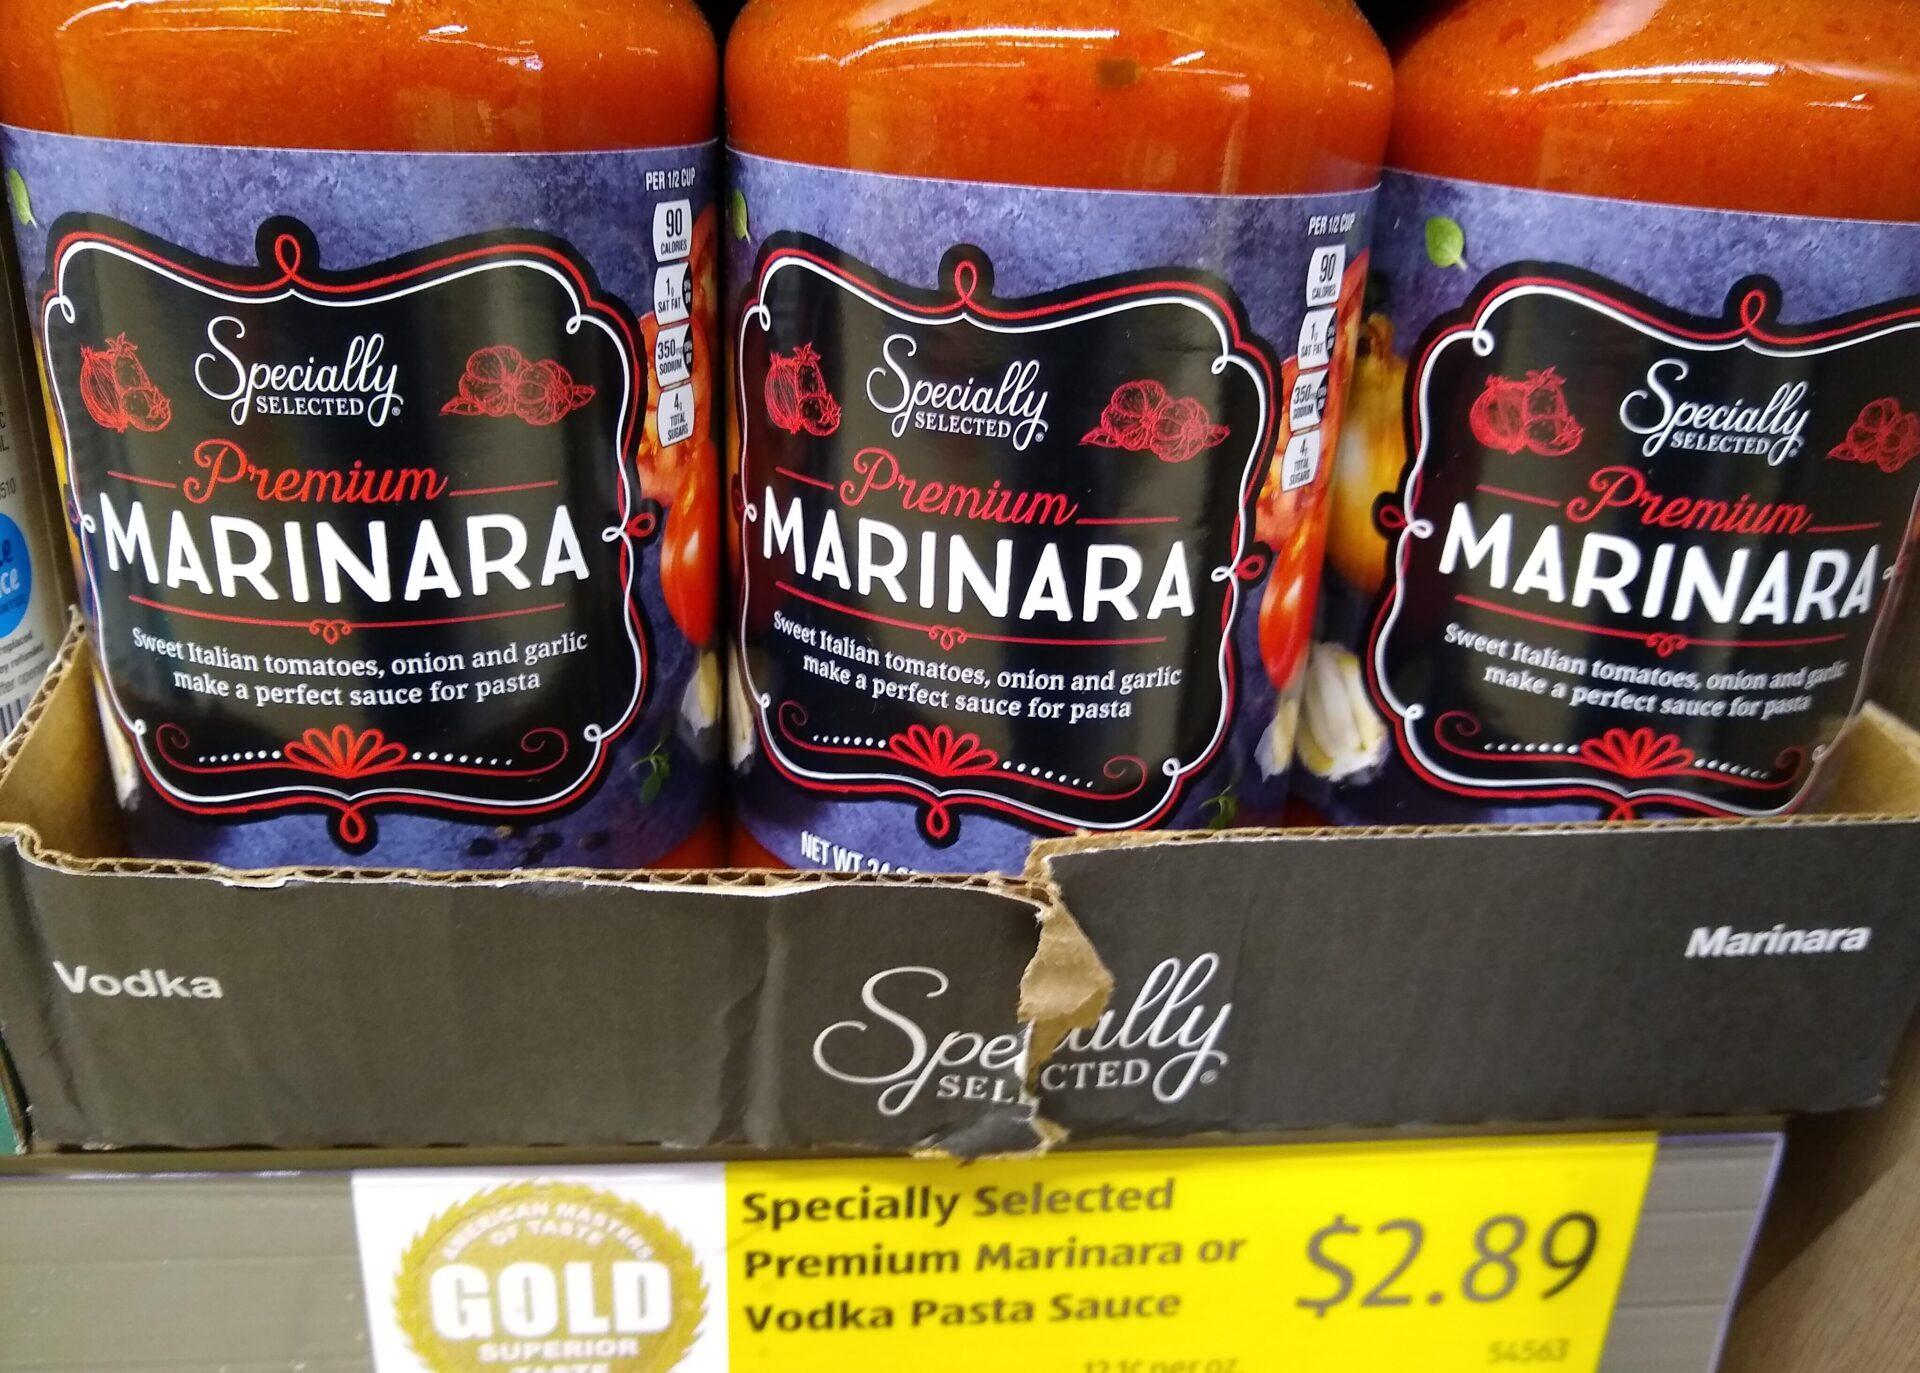 Specially Selected Premium Marinara